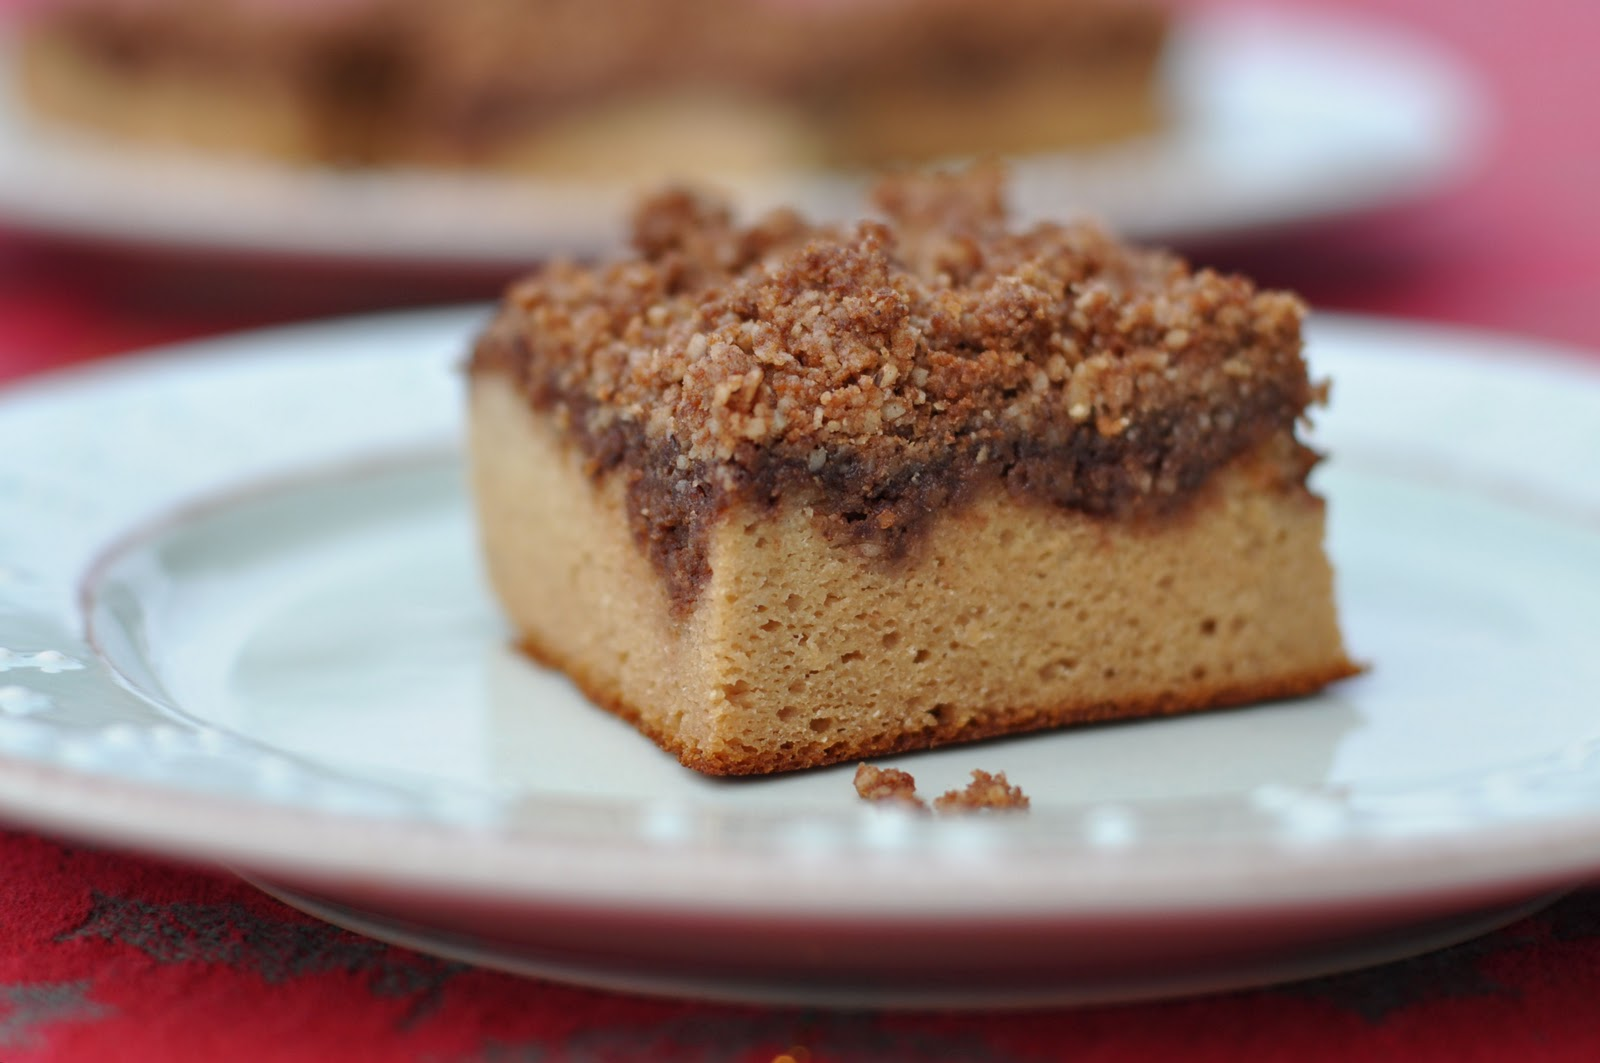 Nourishing Meals: Grain-Free, Dairy-Free Coffee Cake